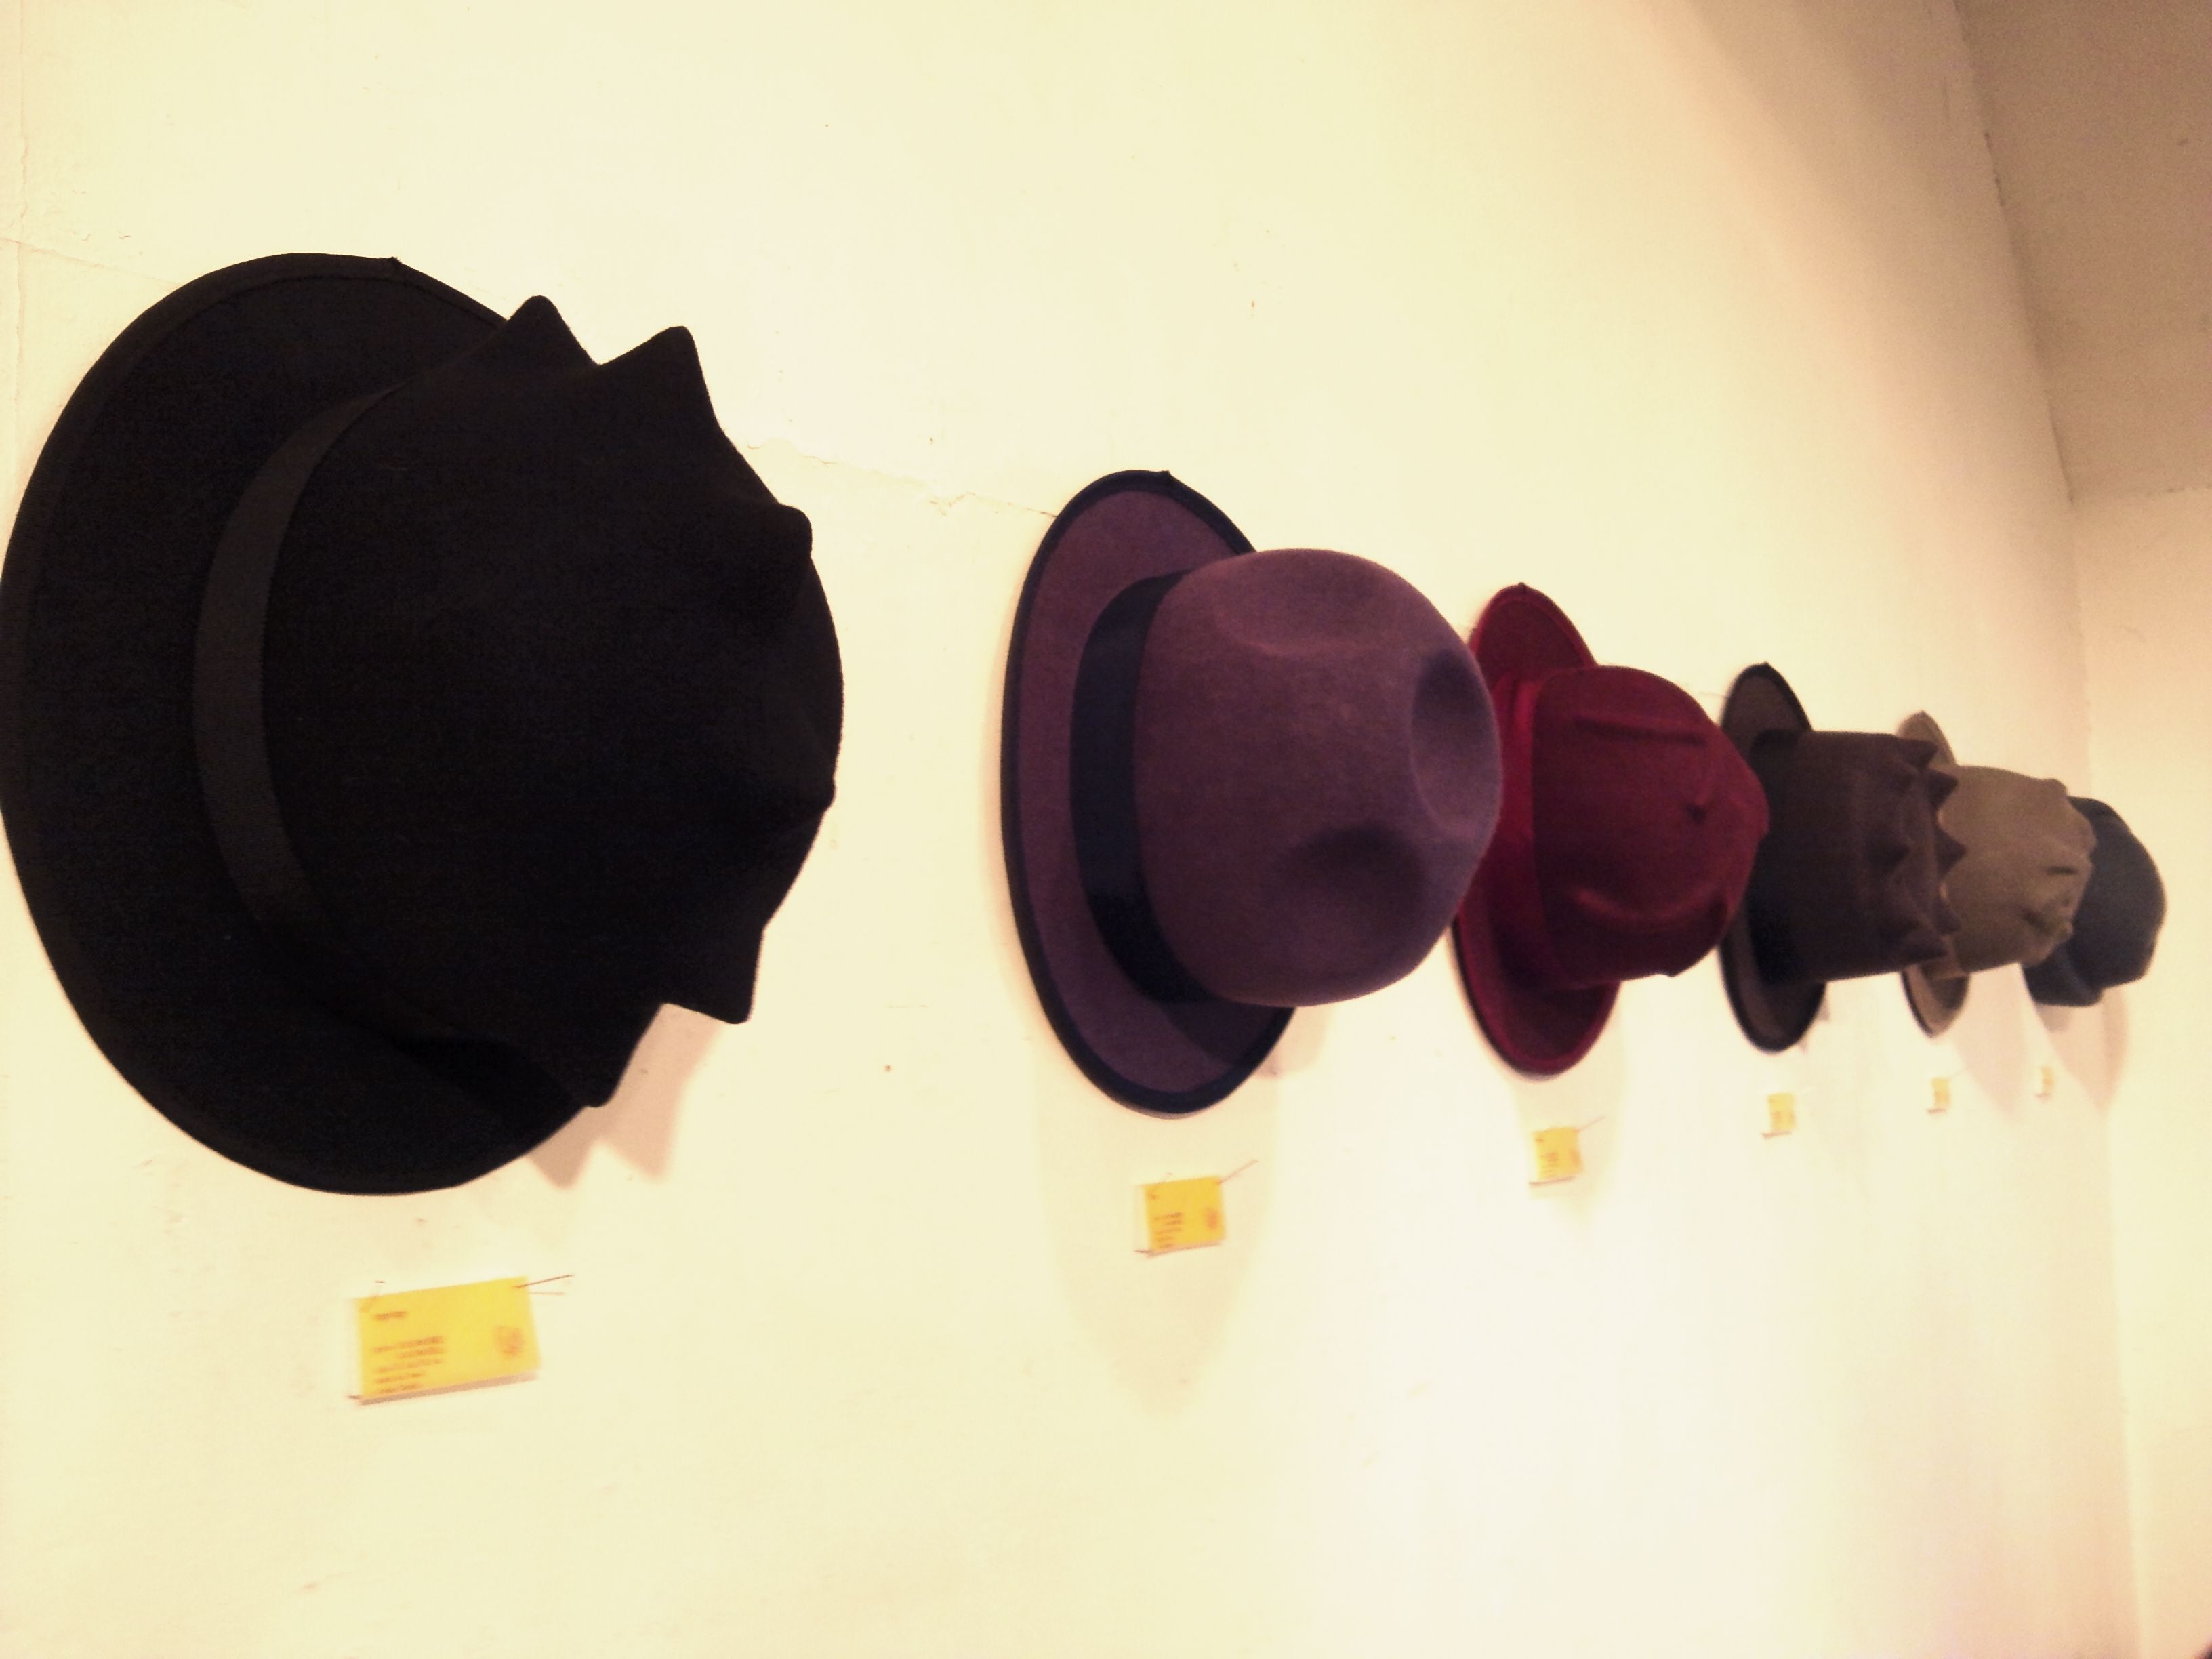 CURIONE 帽子展_c0026674_1529134.jpg